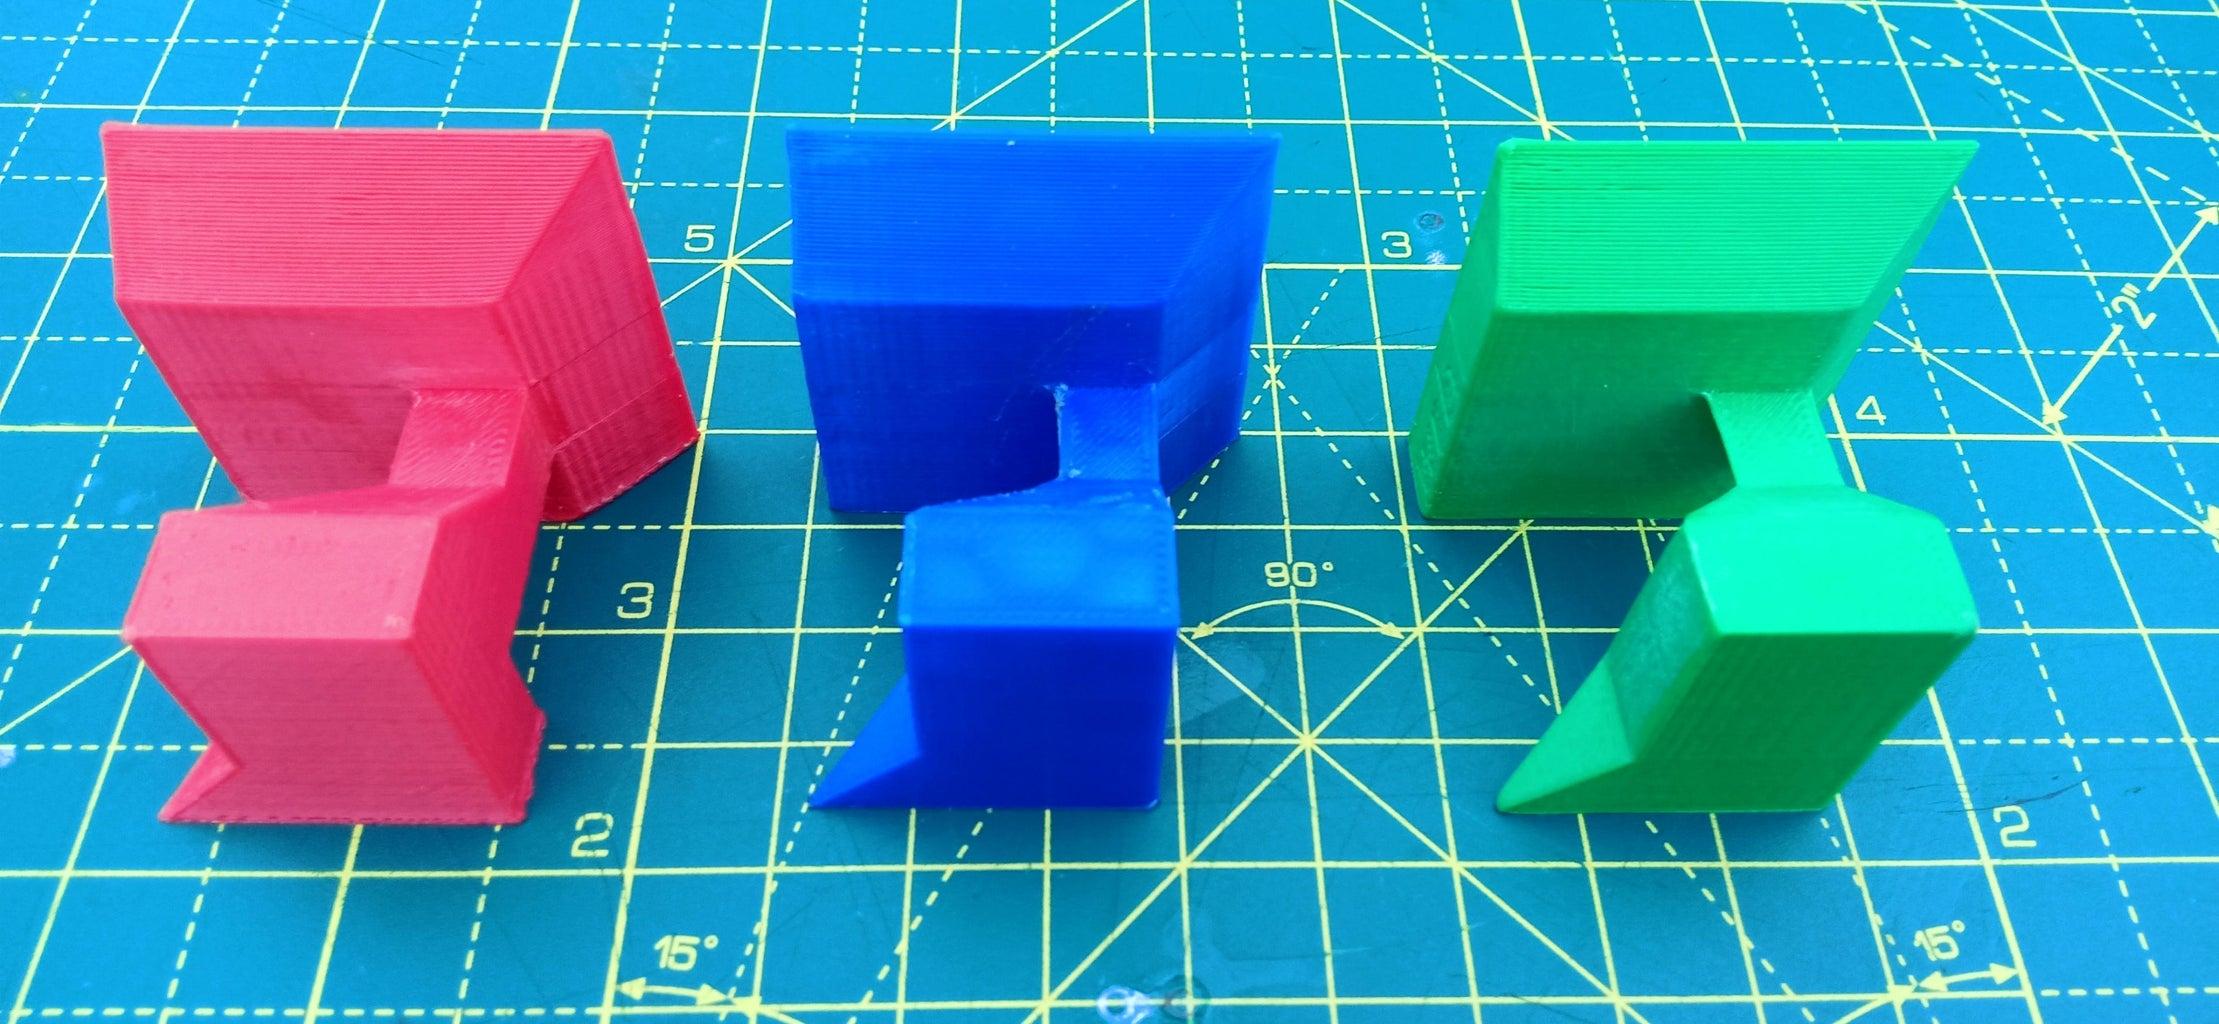 The 3 Piece Cube Puzzle